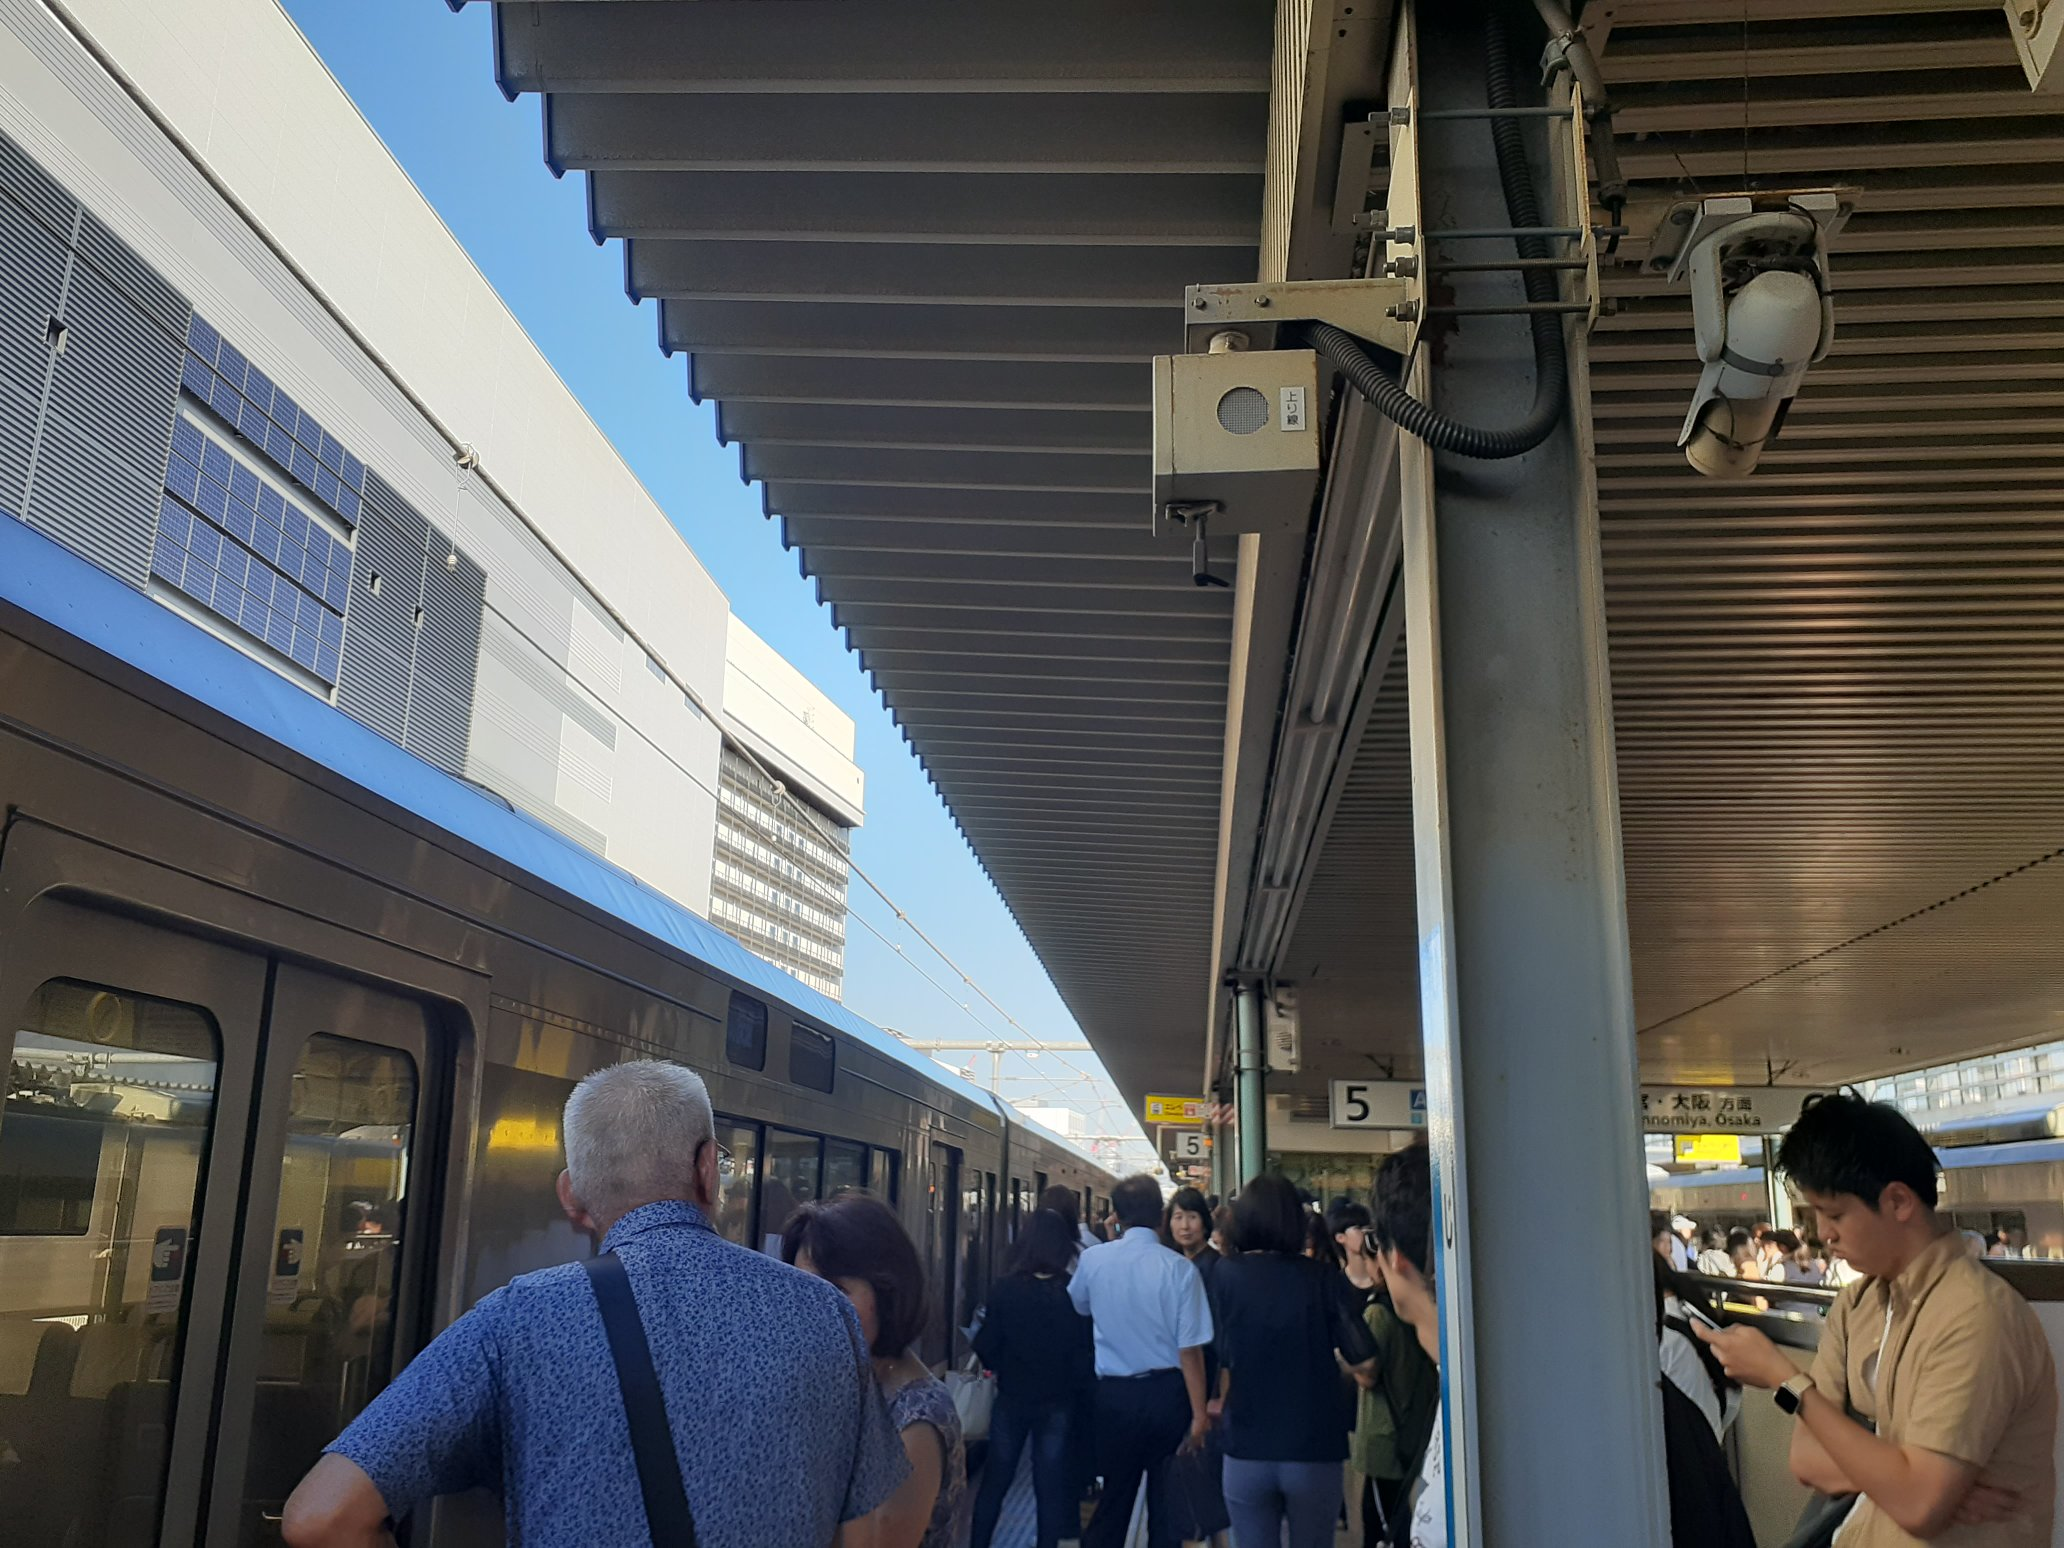 JR神戸線の魚住駅~大久保駅間の人身事故で混雑している画像